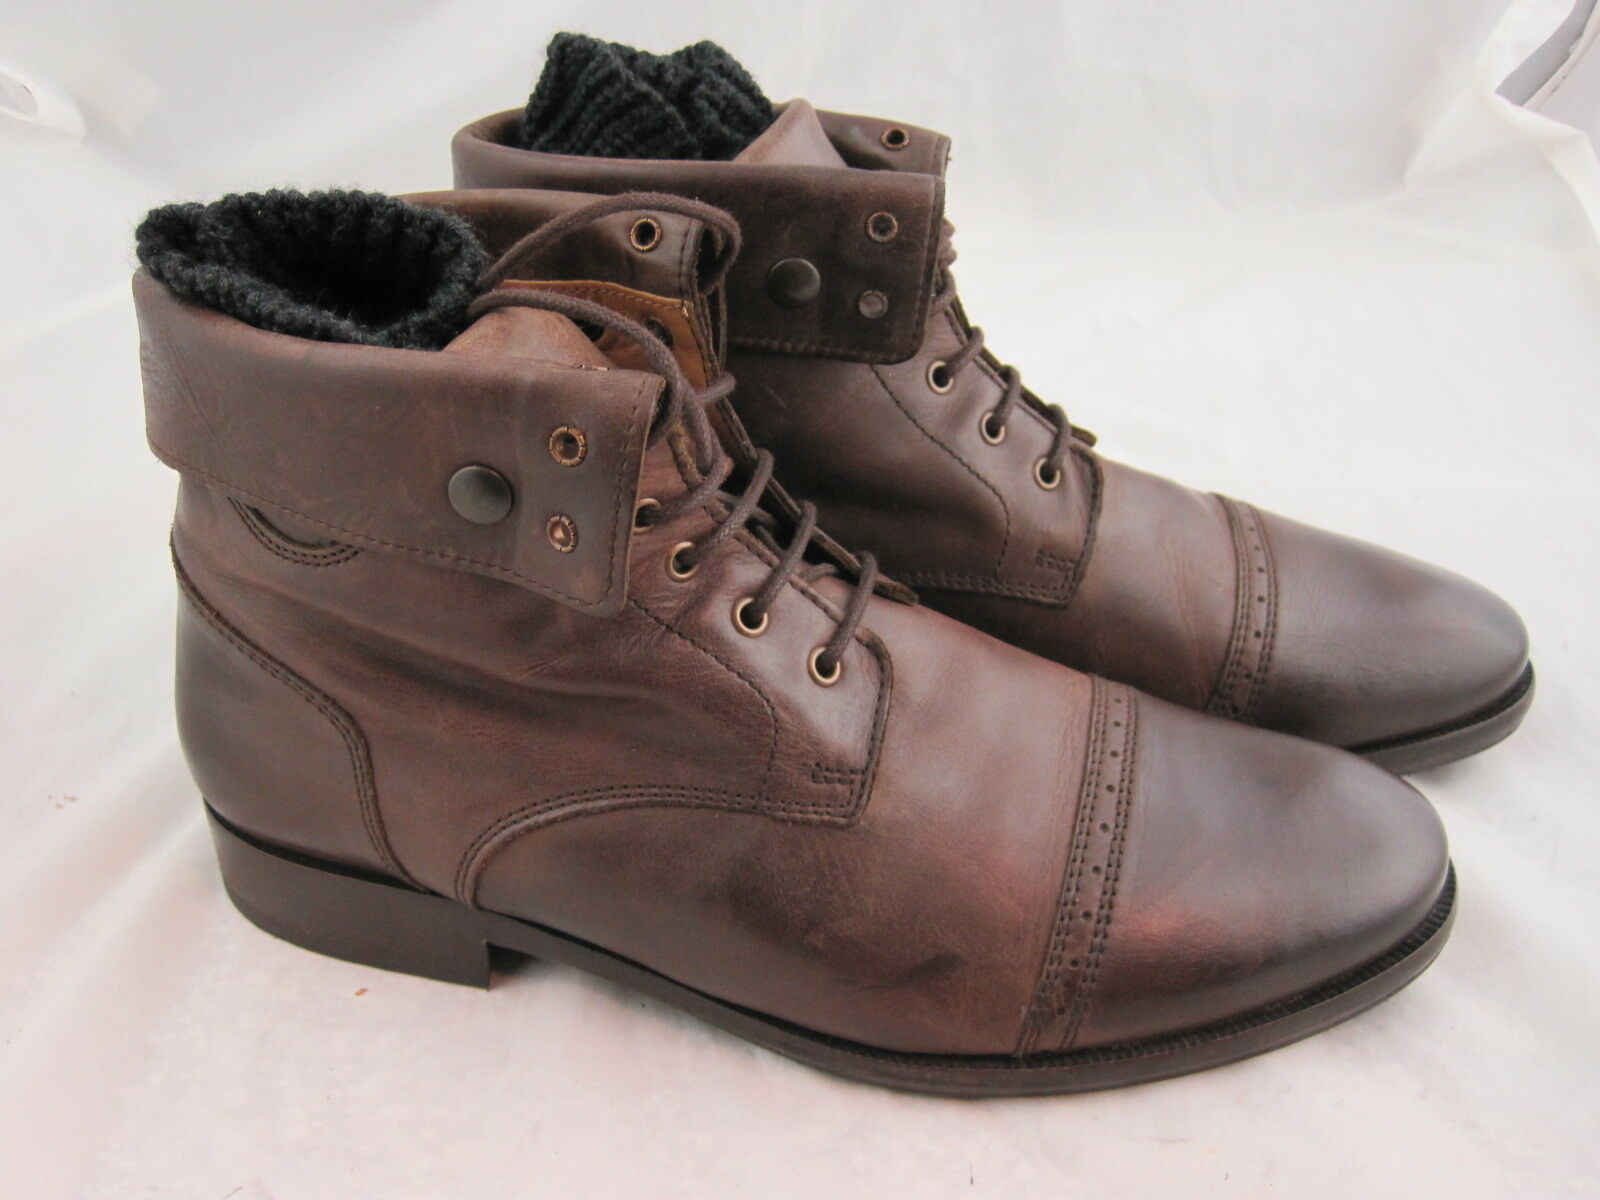 Baldessarini Mens botas in 44 UK 9,5 Top Condition High Original Price marrón